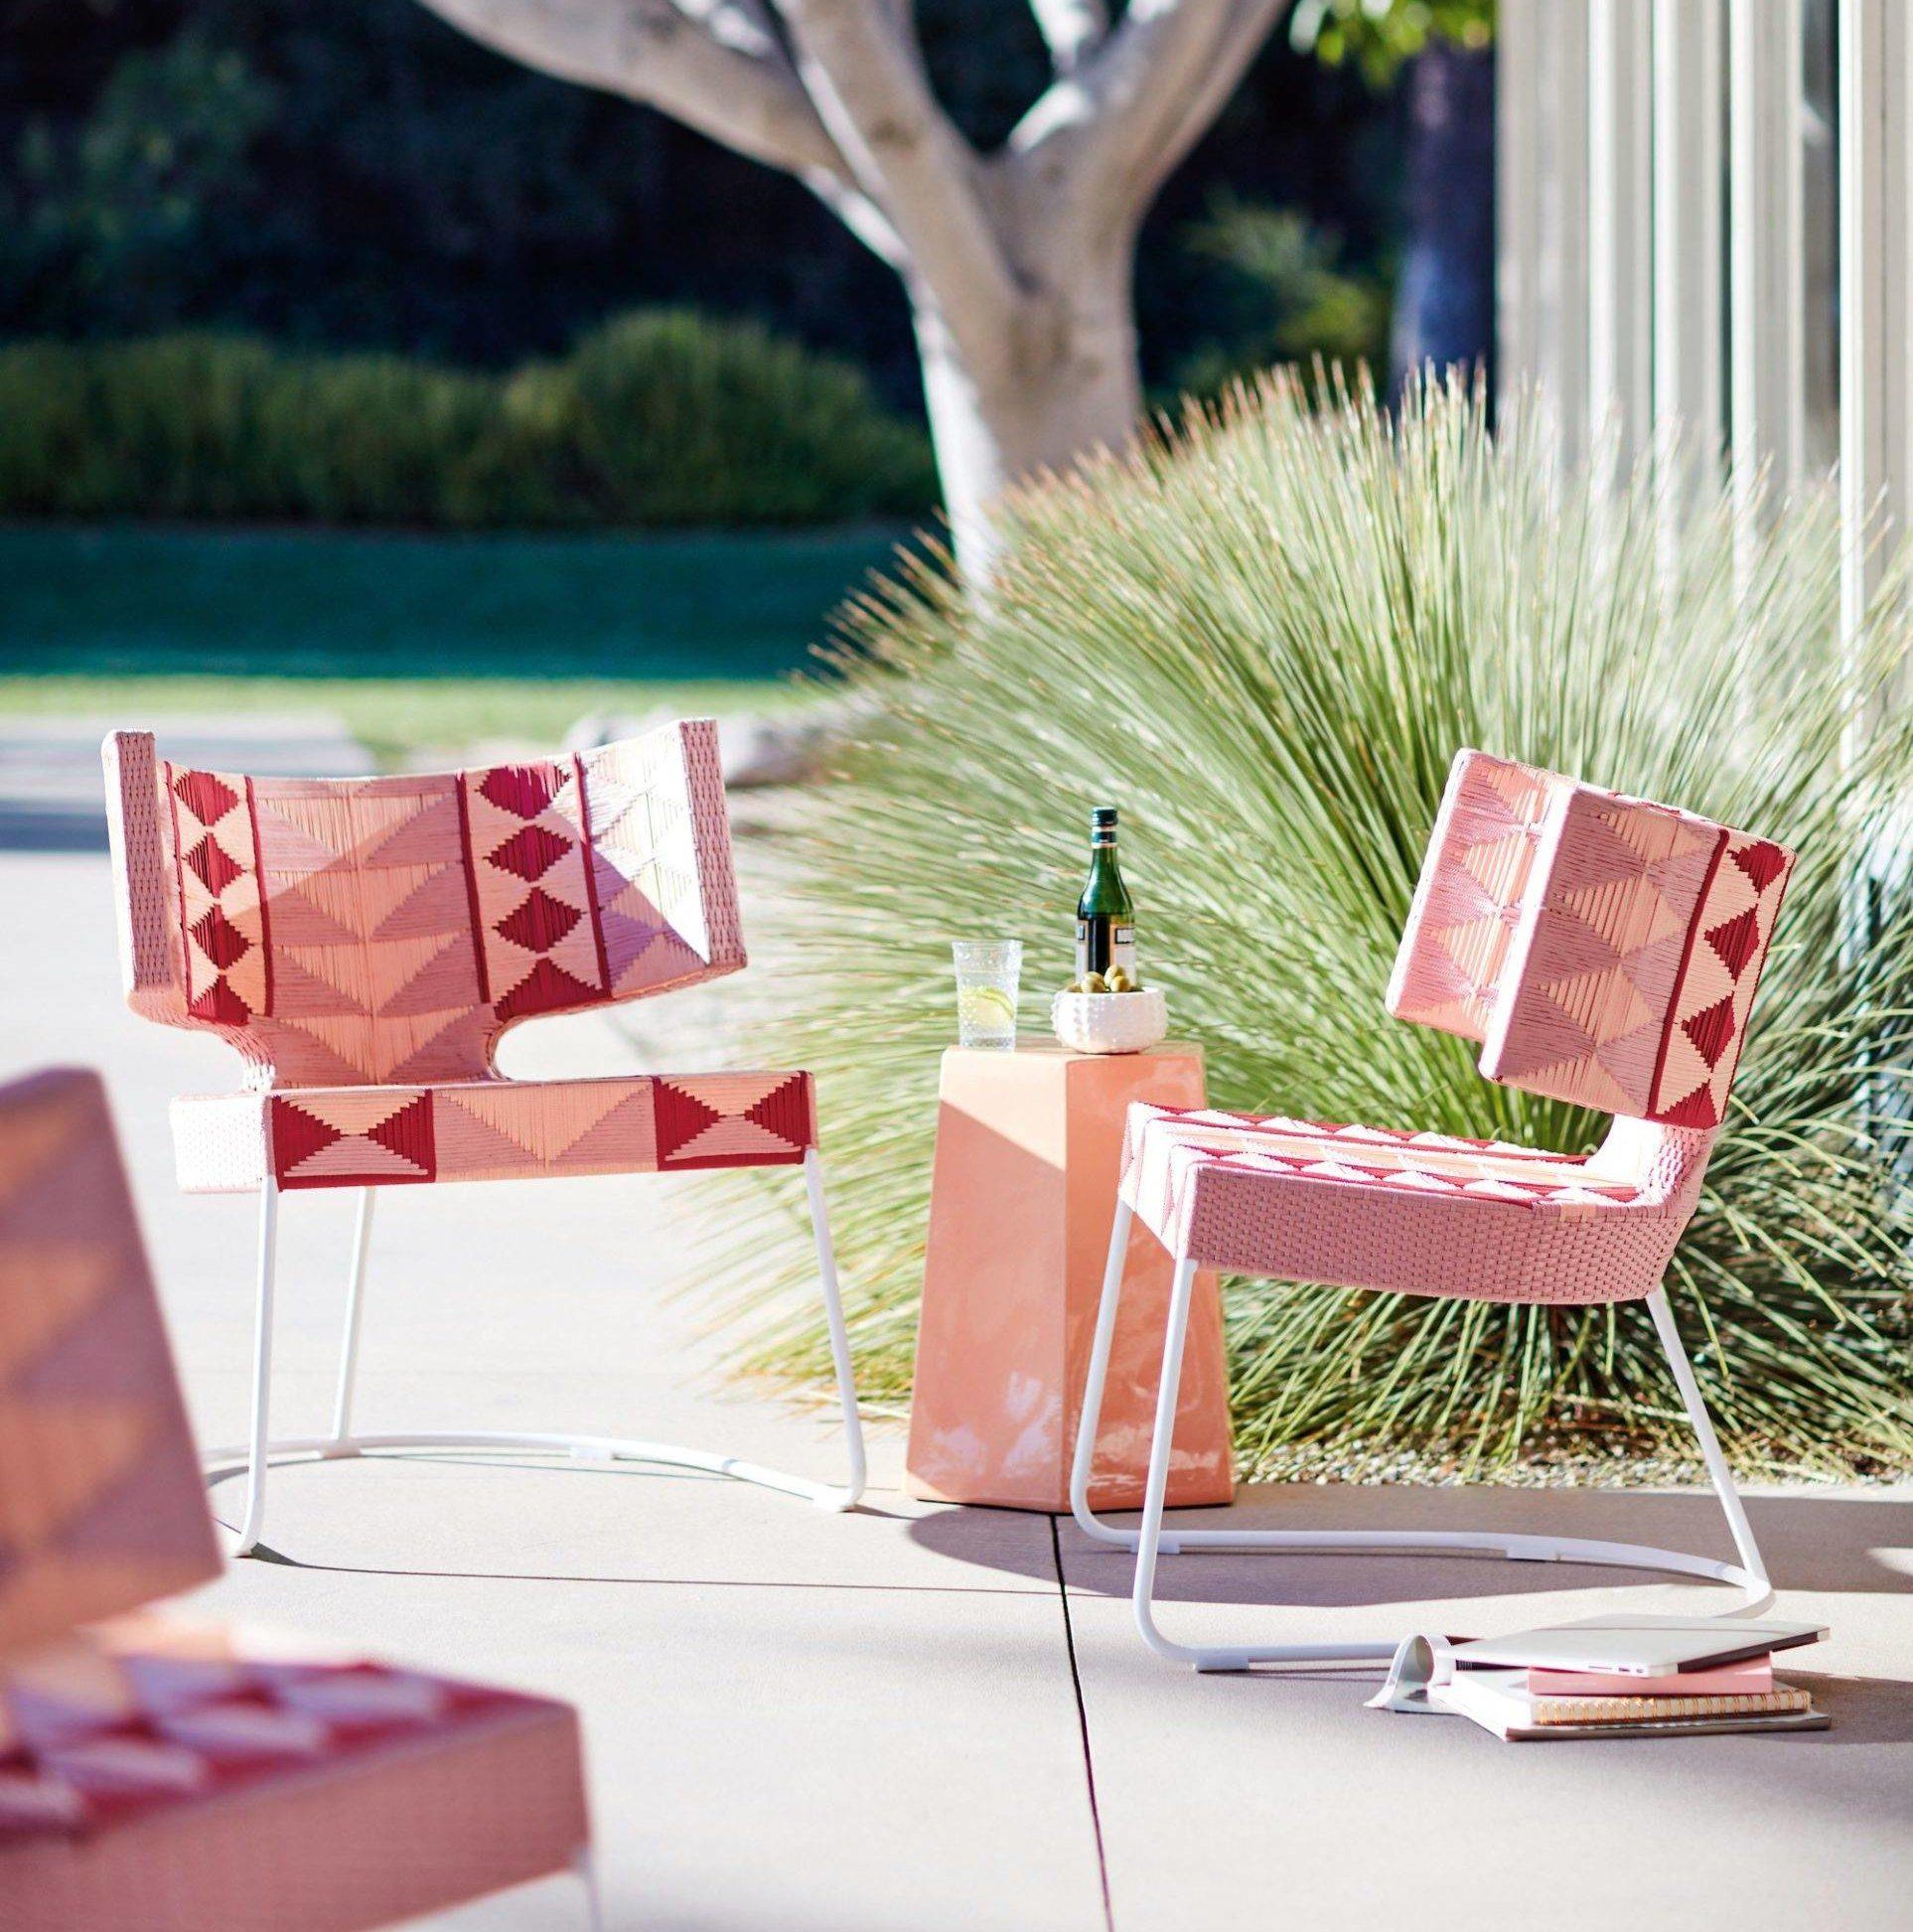 Anthropologie Patio Decorative Outdoor Wicker Chairs Pink Aztec Geo Seating